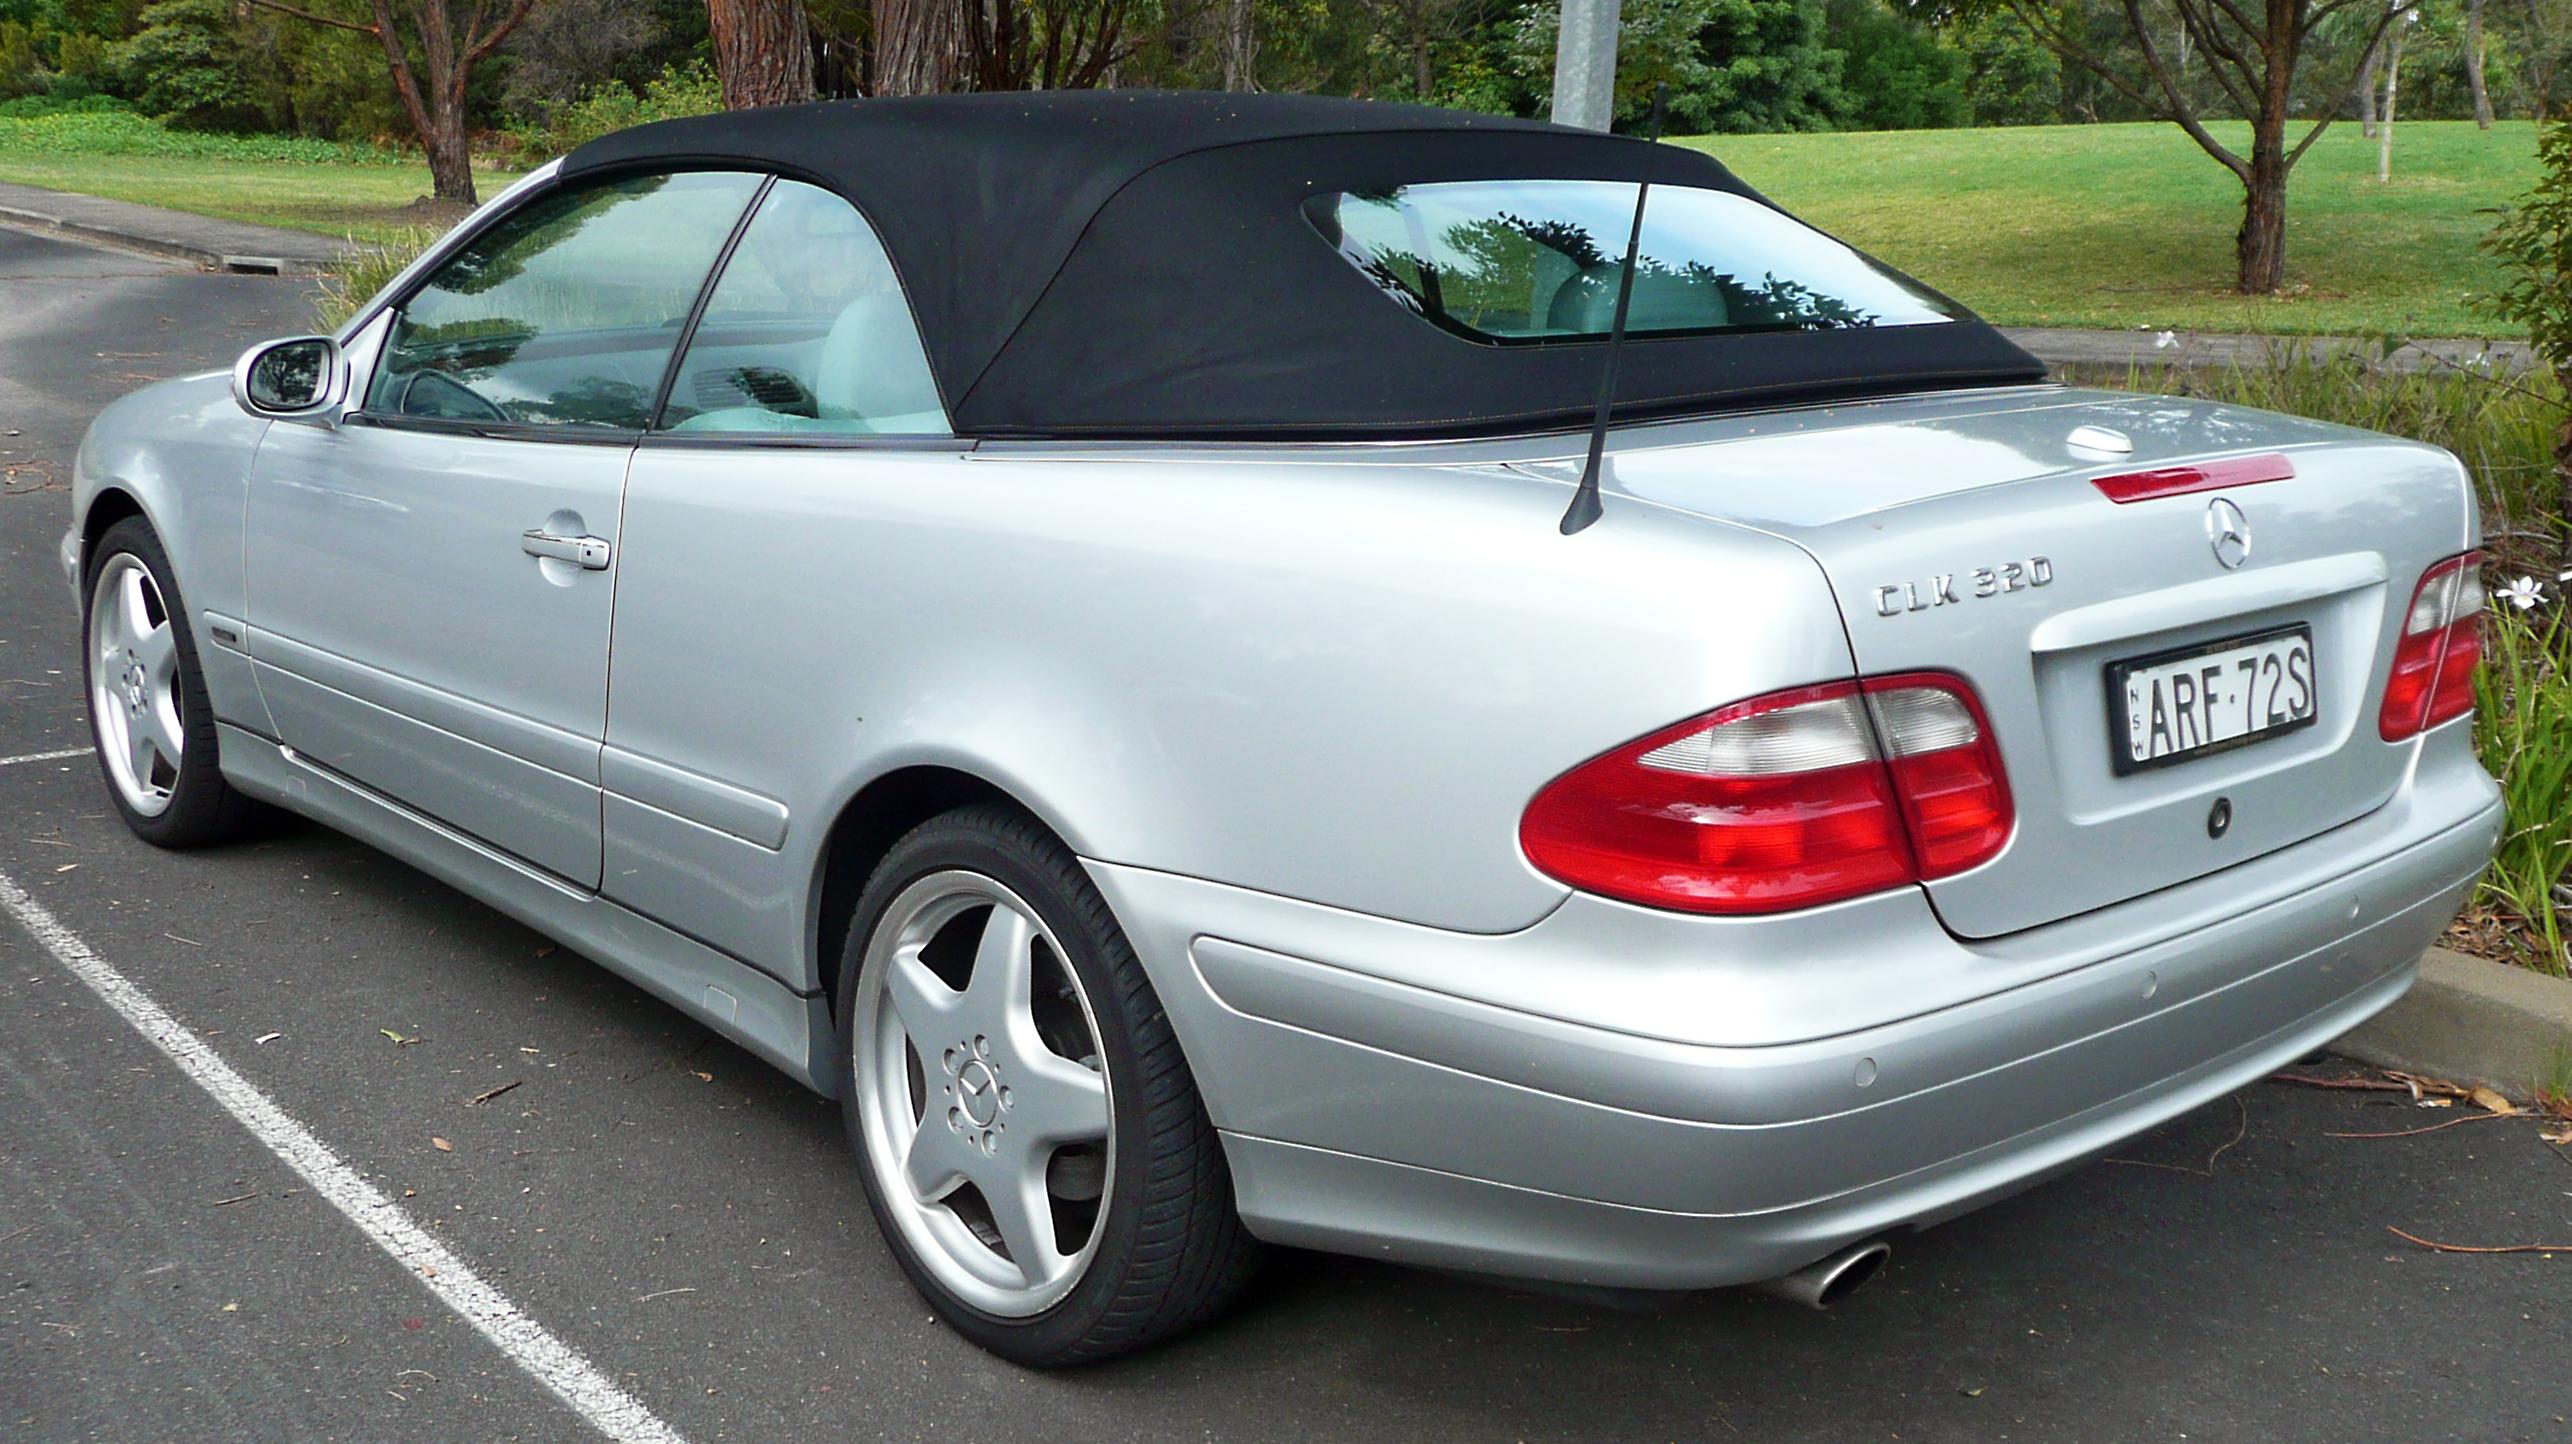 file:1999-2003 mercedes-benz clk 320 (a 208) elegance convertible